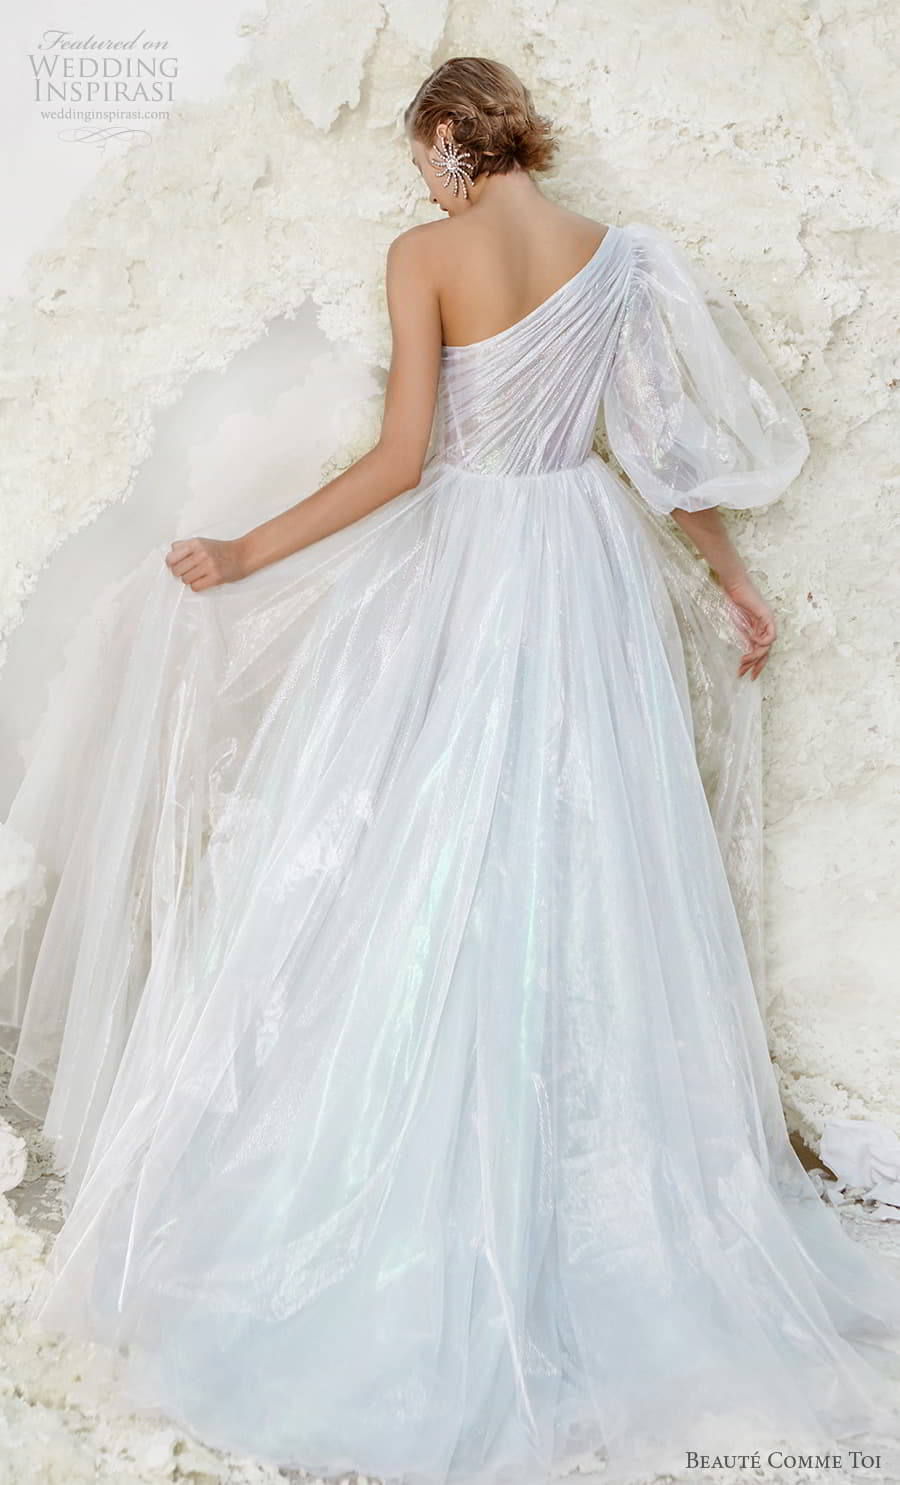 beaute comme toi spring 2022 bridal one shoulder three quarter bishop sleeves ruched bodice glitter elegant a line wedding dress slit skirt chapel train (verna) bv